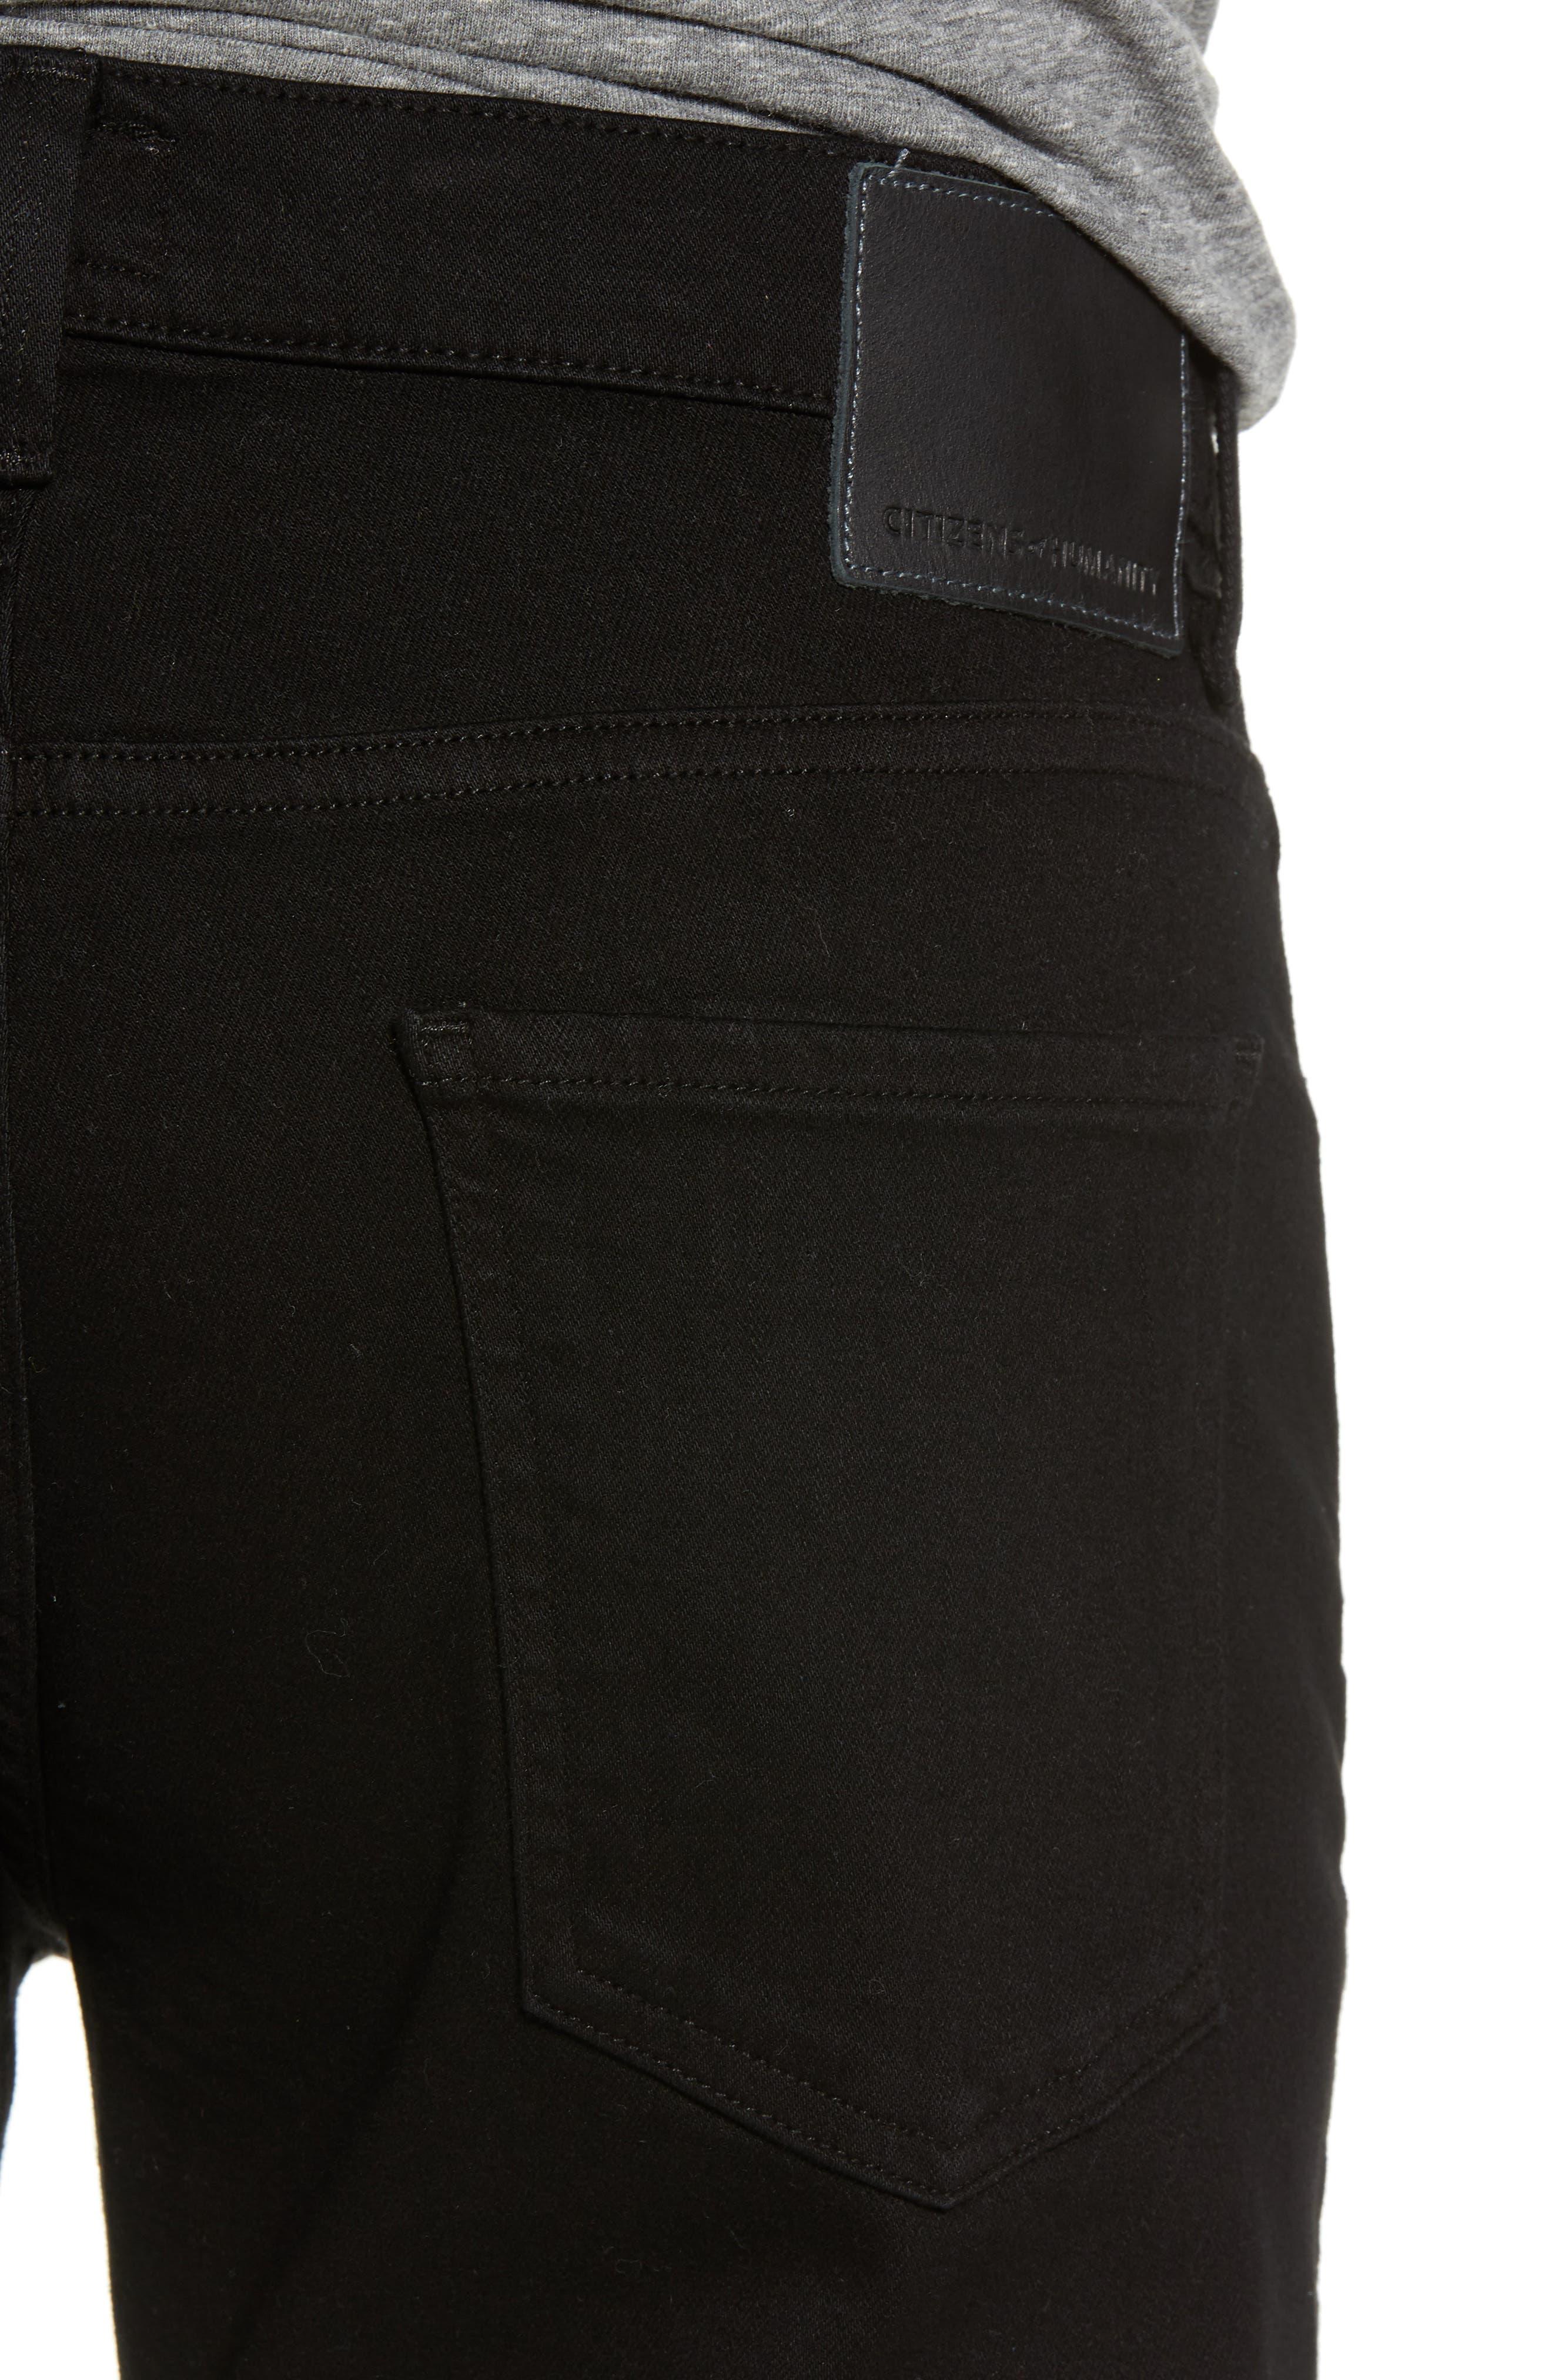 Perform - Sid Straight Leg Jeans,                             Alternate thumbnail 4, color,                             PARKER